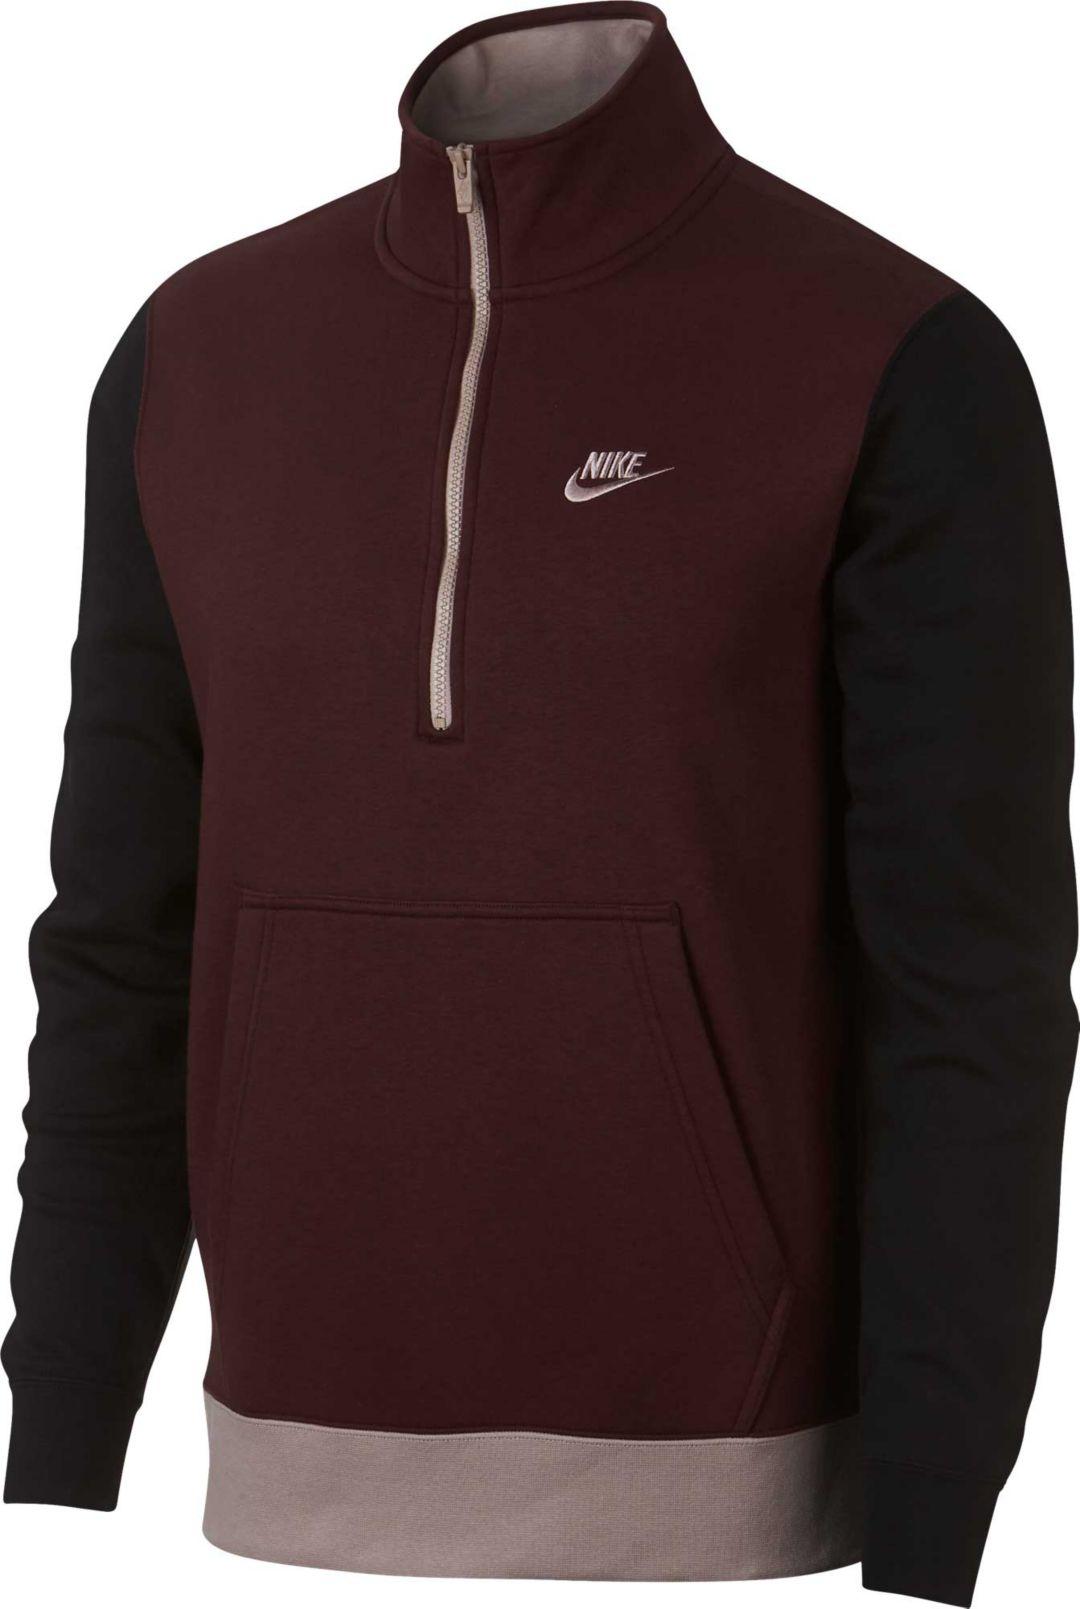 2f938ea6a7655 Nike Men's Sportswear Club 1/2 Zip Pullover. noImageFound. Previous